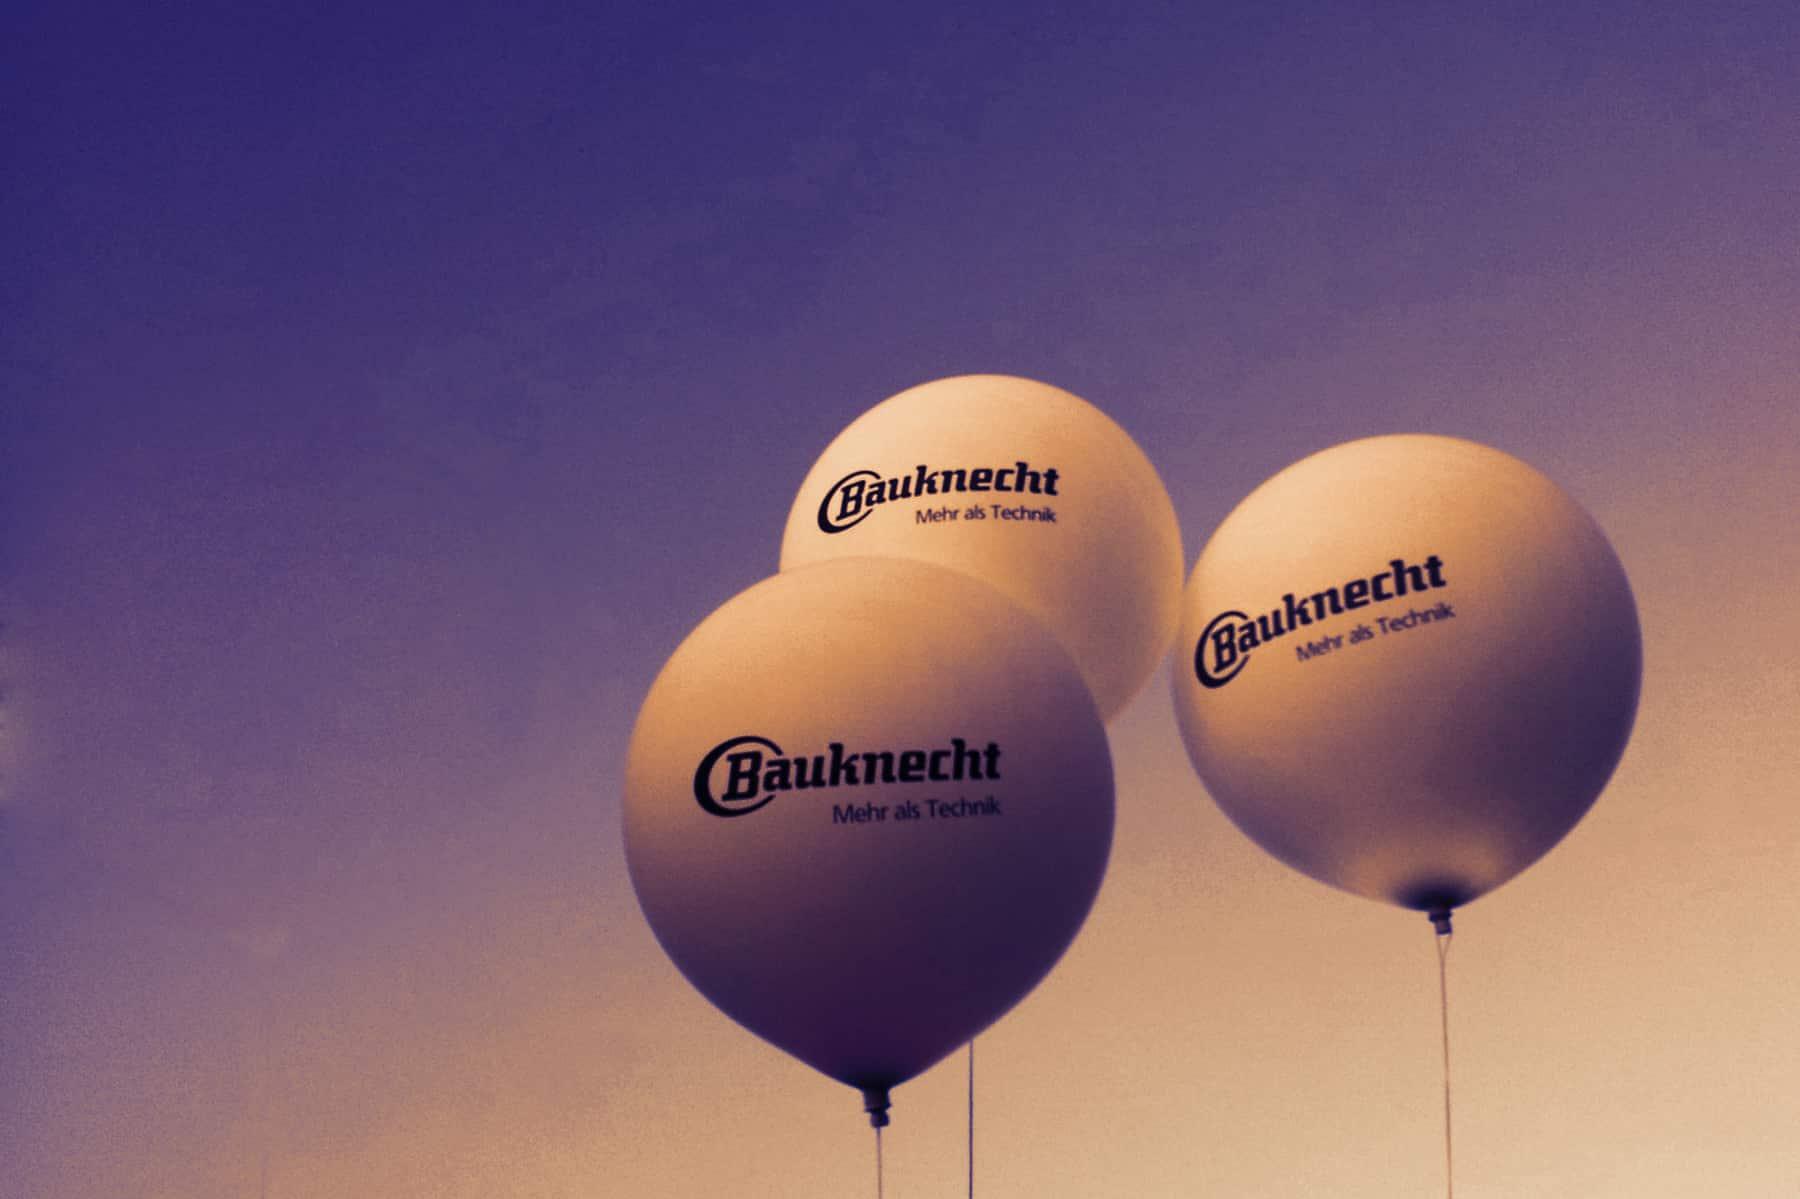 Drei Messeballons mit Heliumfüllung